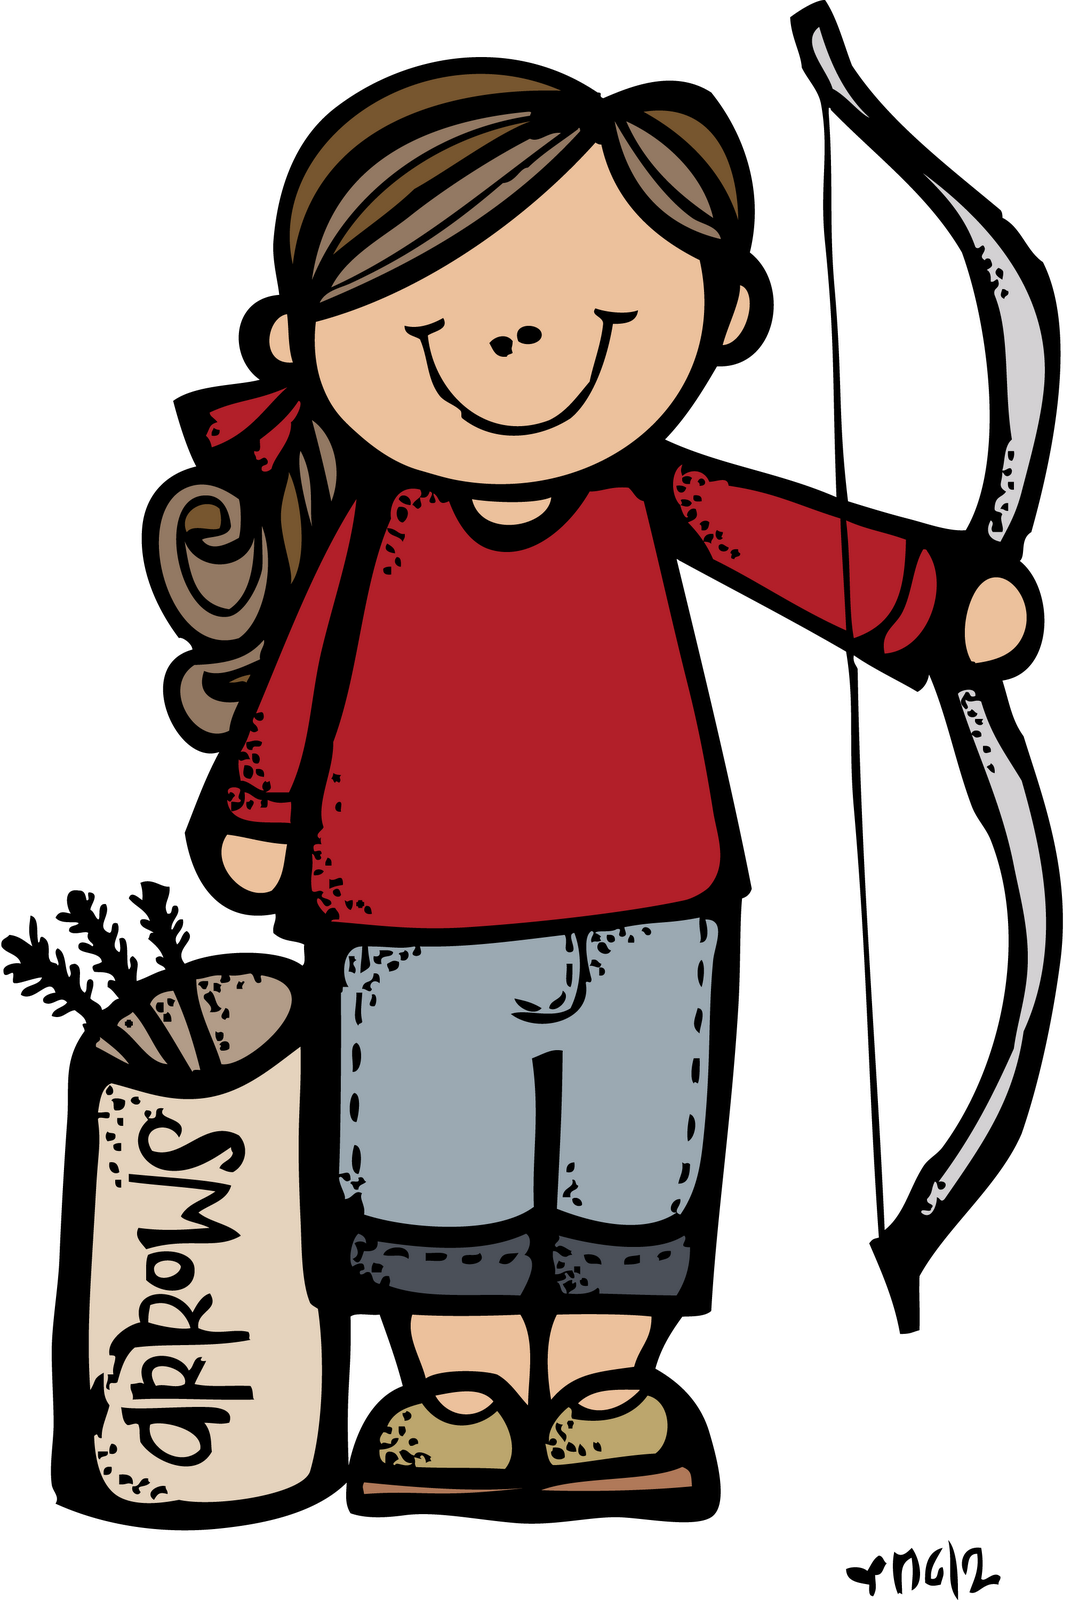 vector free library Girl archery clipart. Melonheadz lds illustrating girls